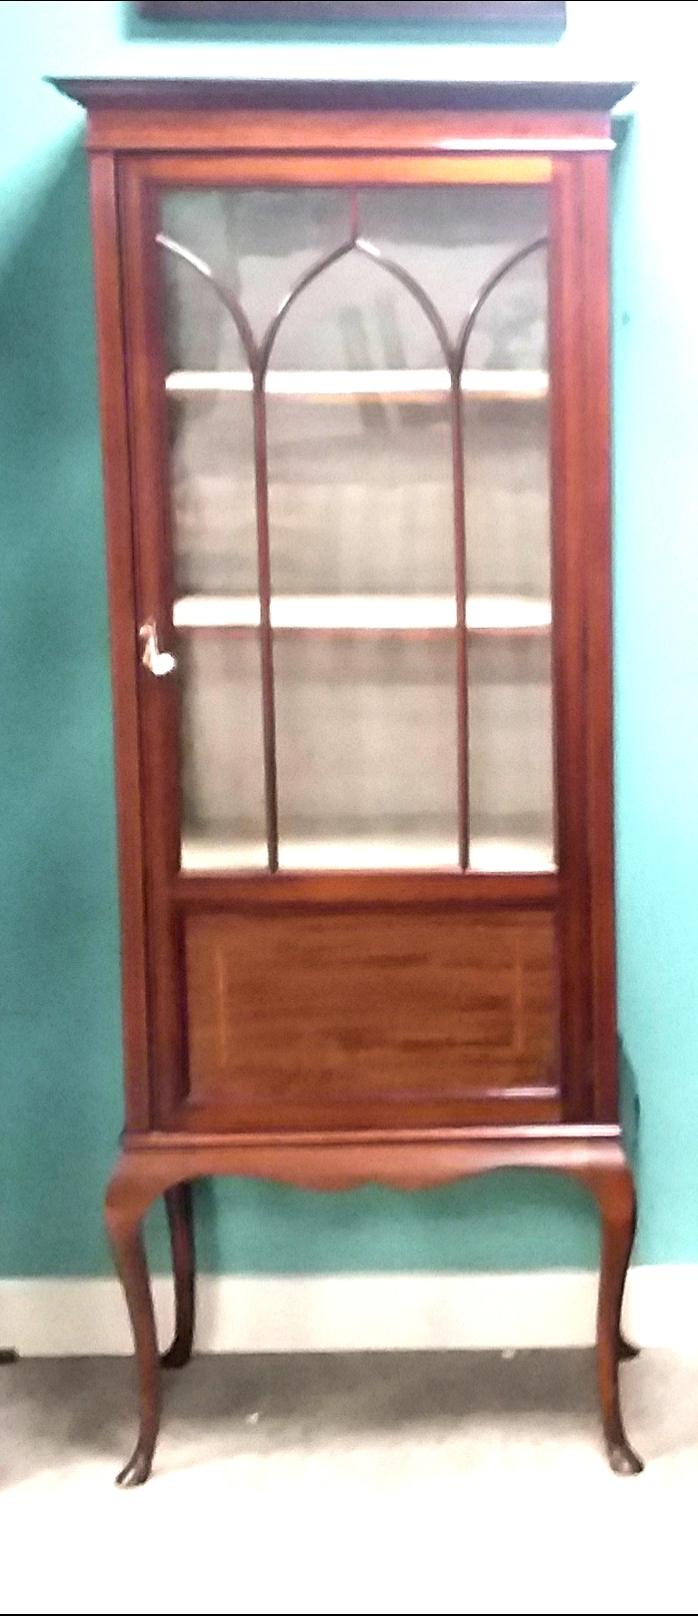 Lot 29 - Edw Inlaid Mahogany Single Door Display Cabinet Dimensions: 79cm W 39cm D 175cm H